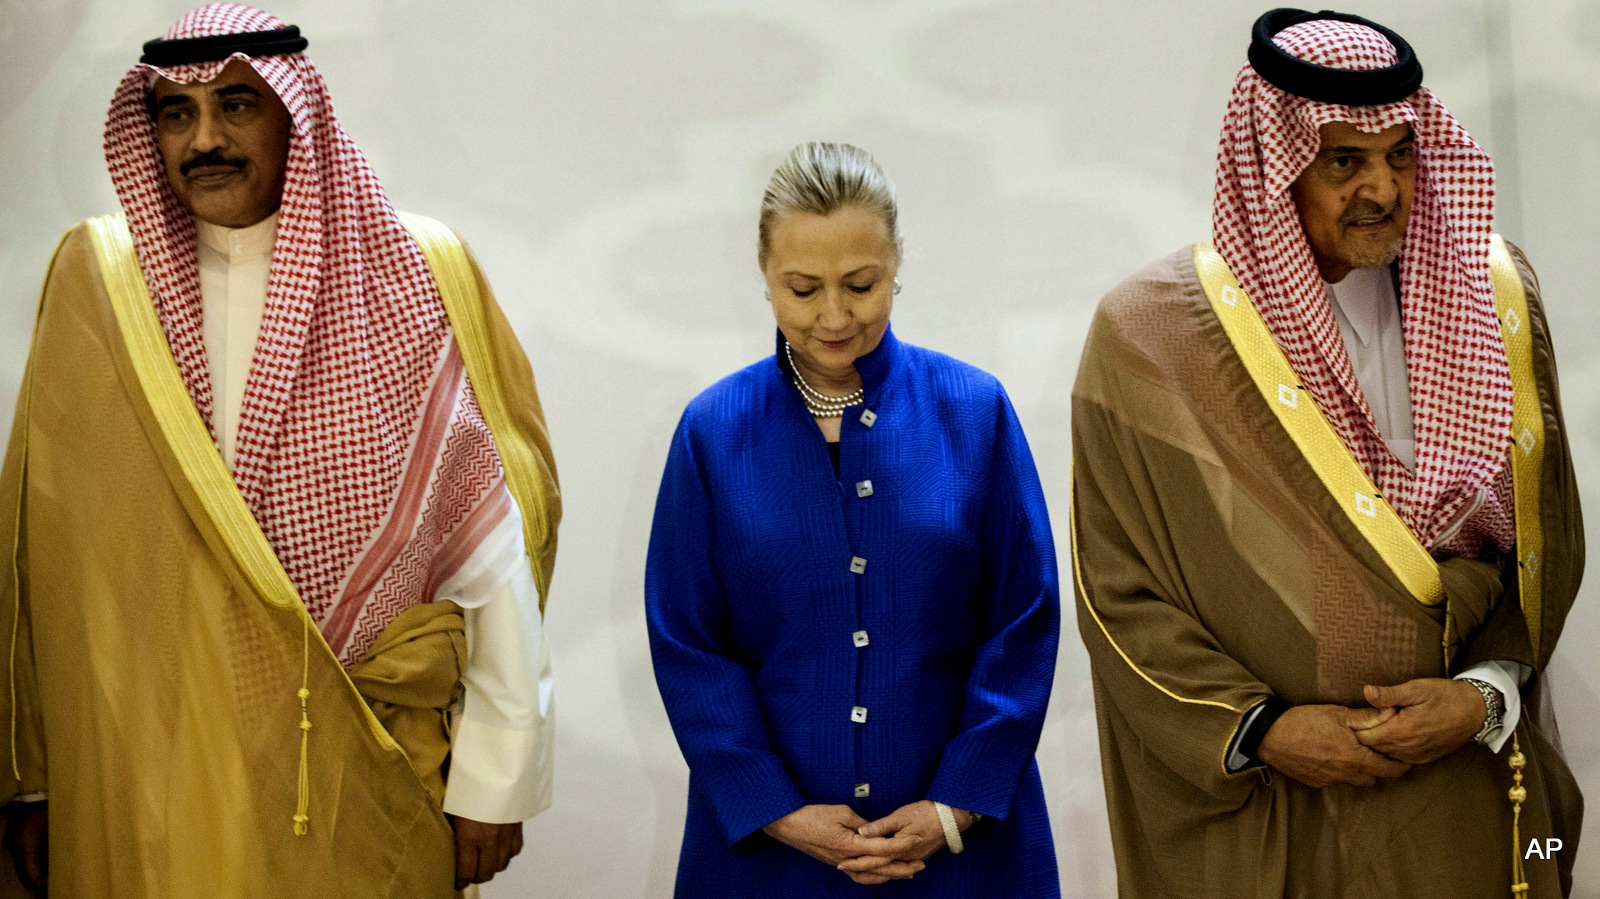 Emailovi Clintone, oil giganti i terorizam protiv šija muslimana